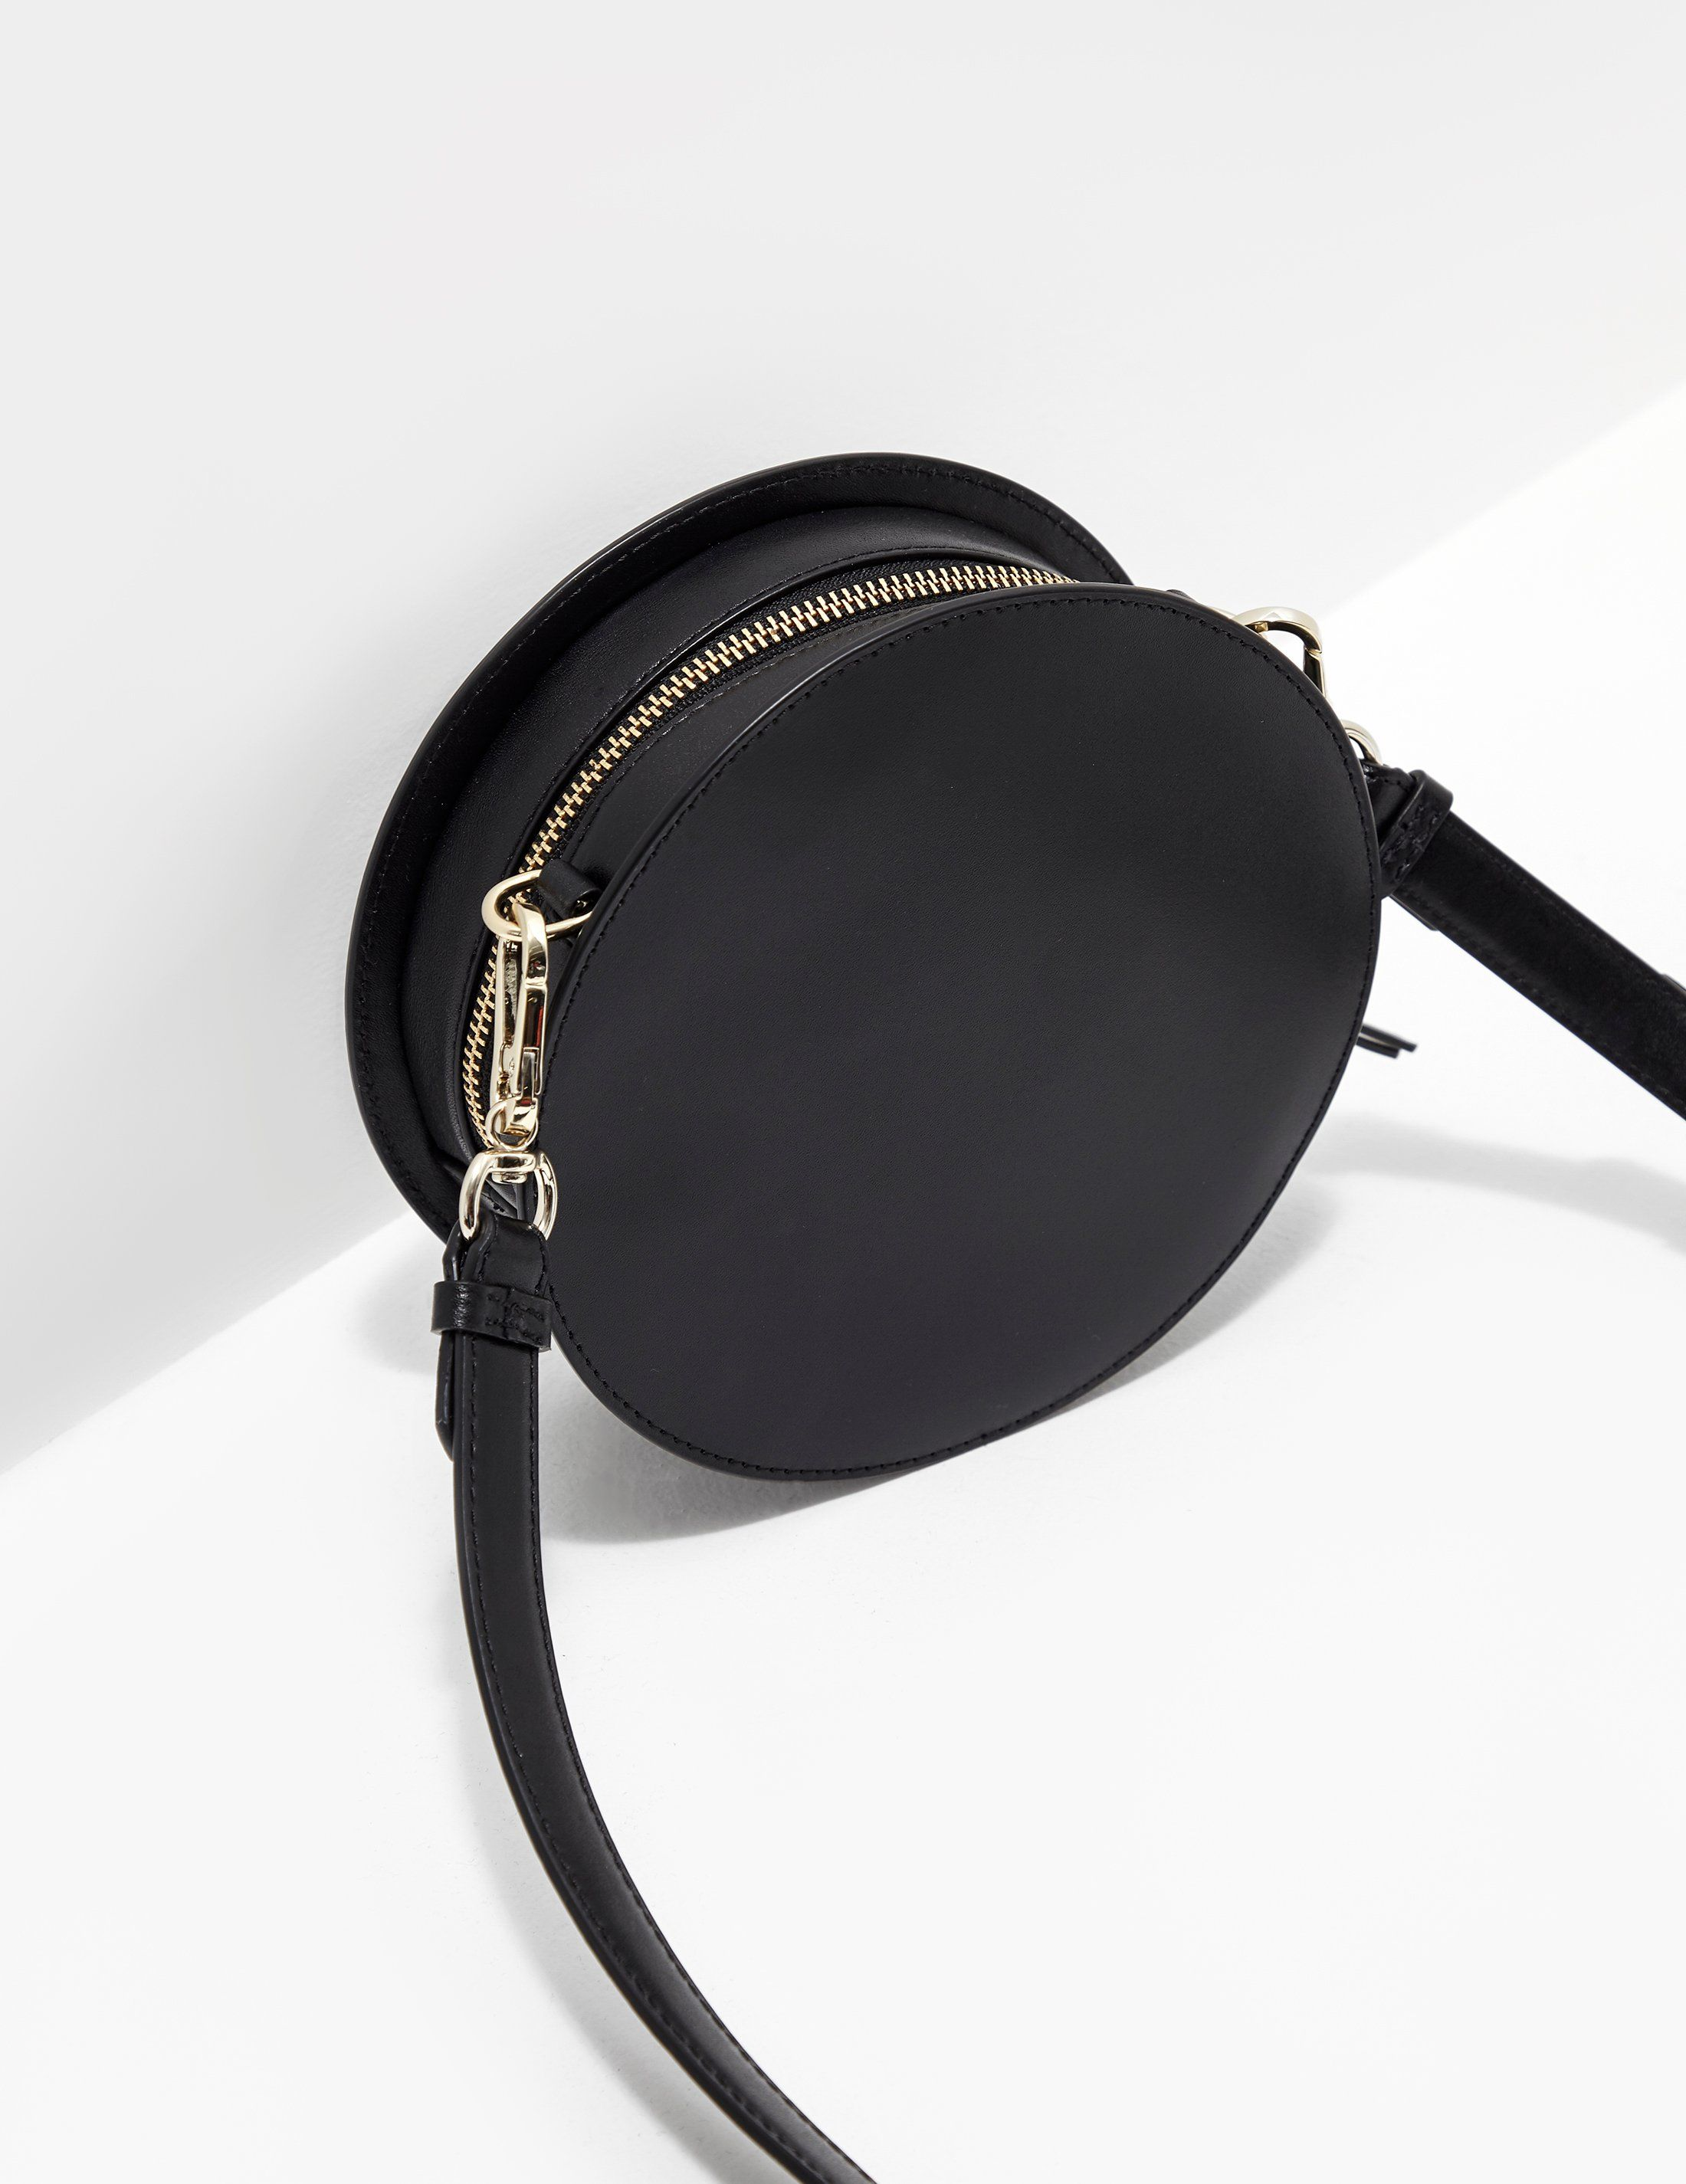 Karl Lagerfeld Round Shoulder Bag